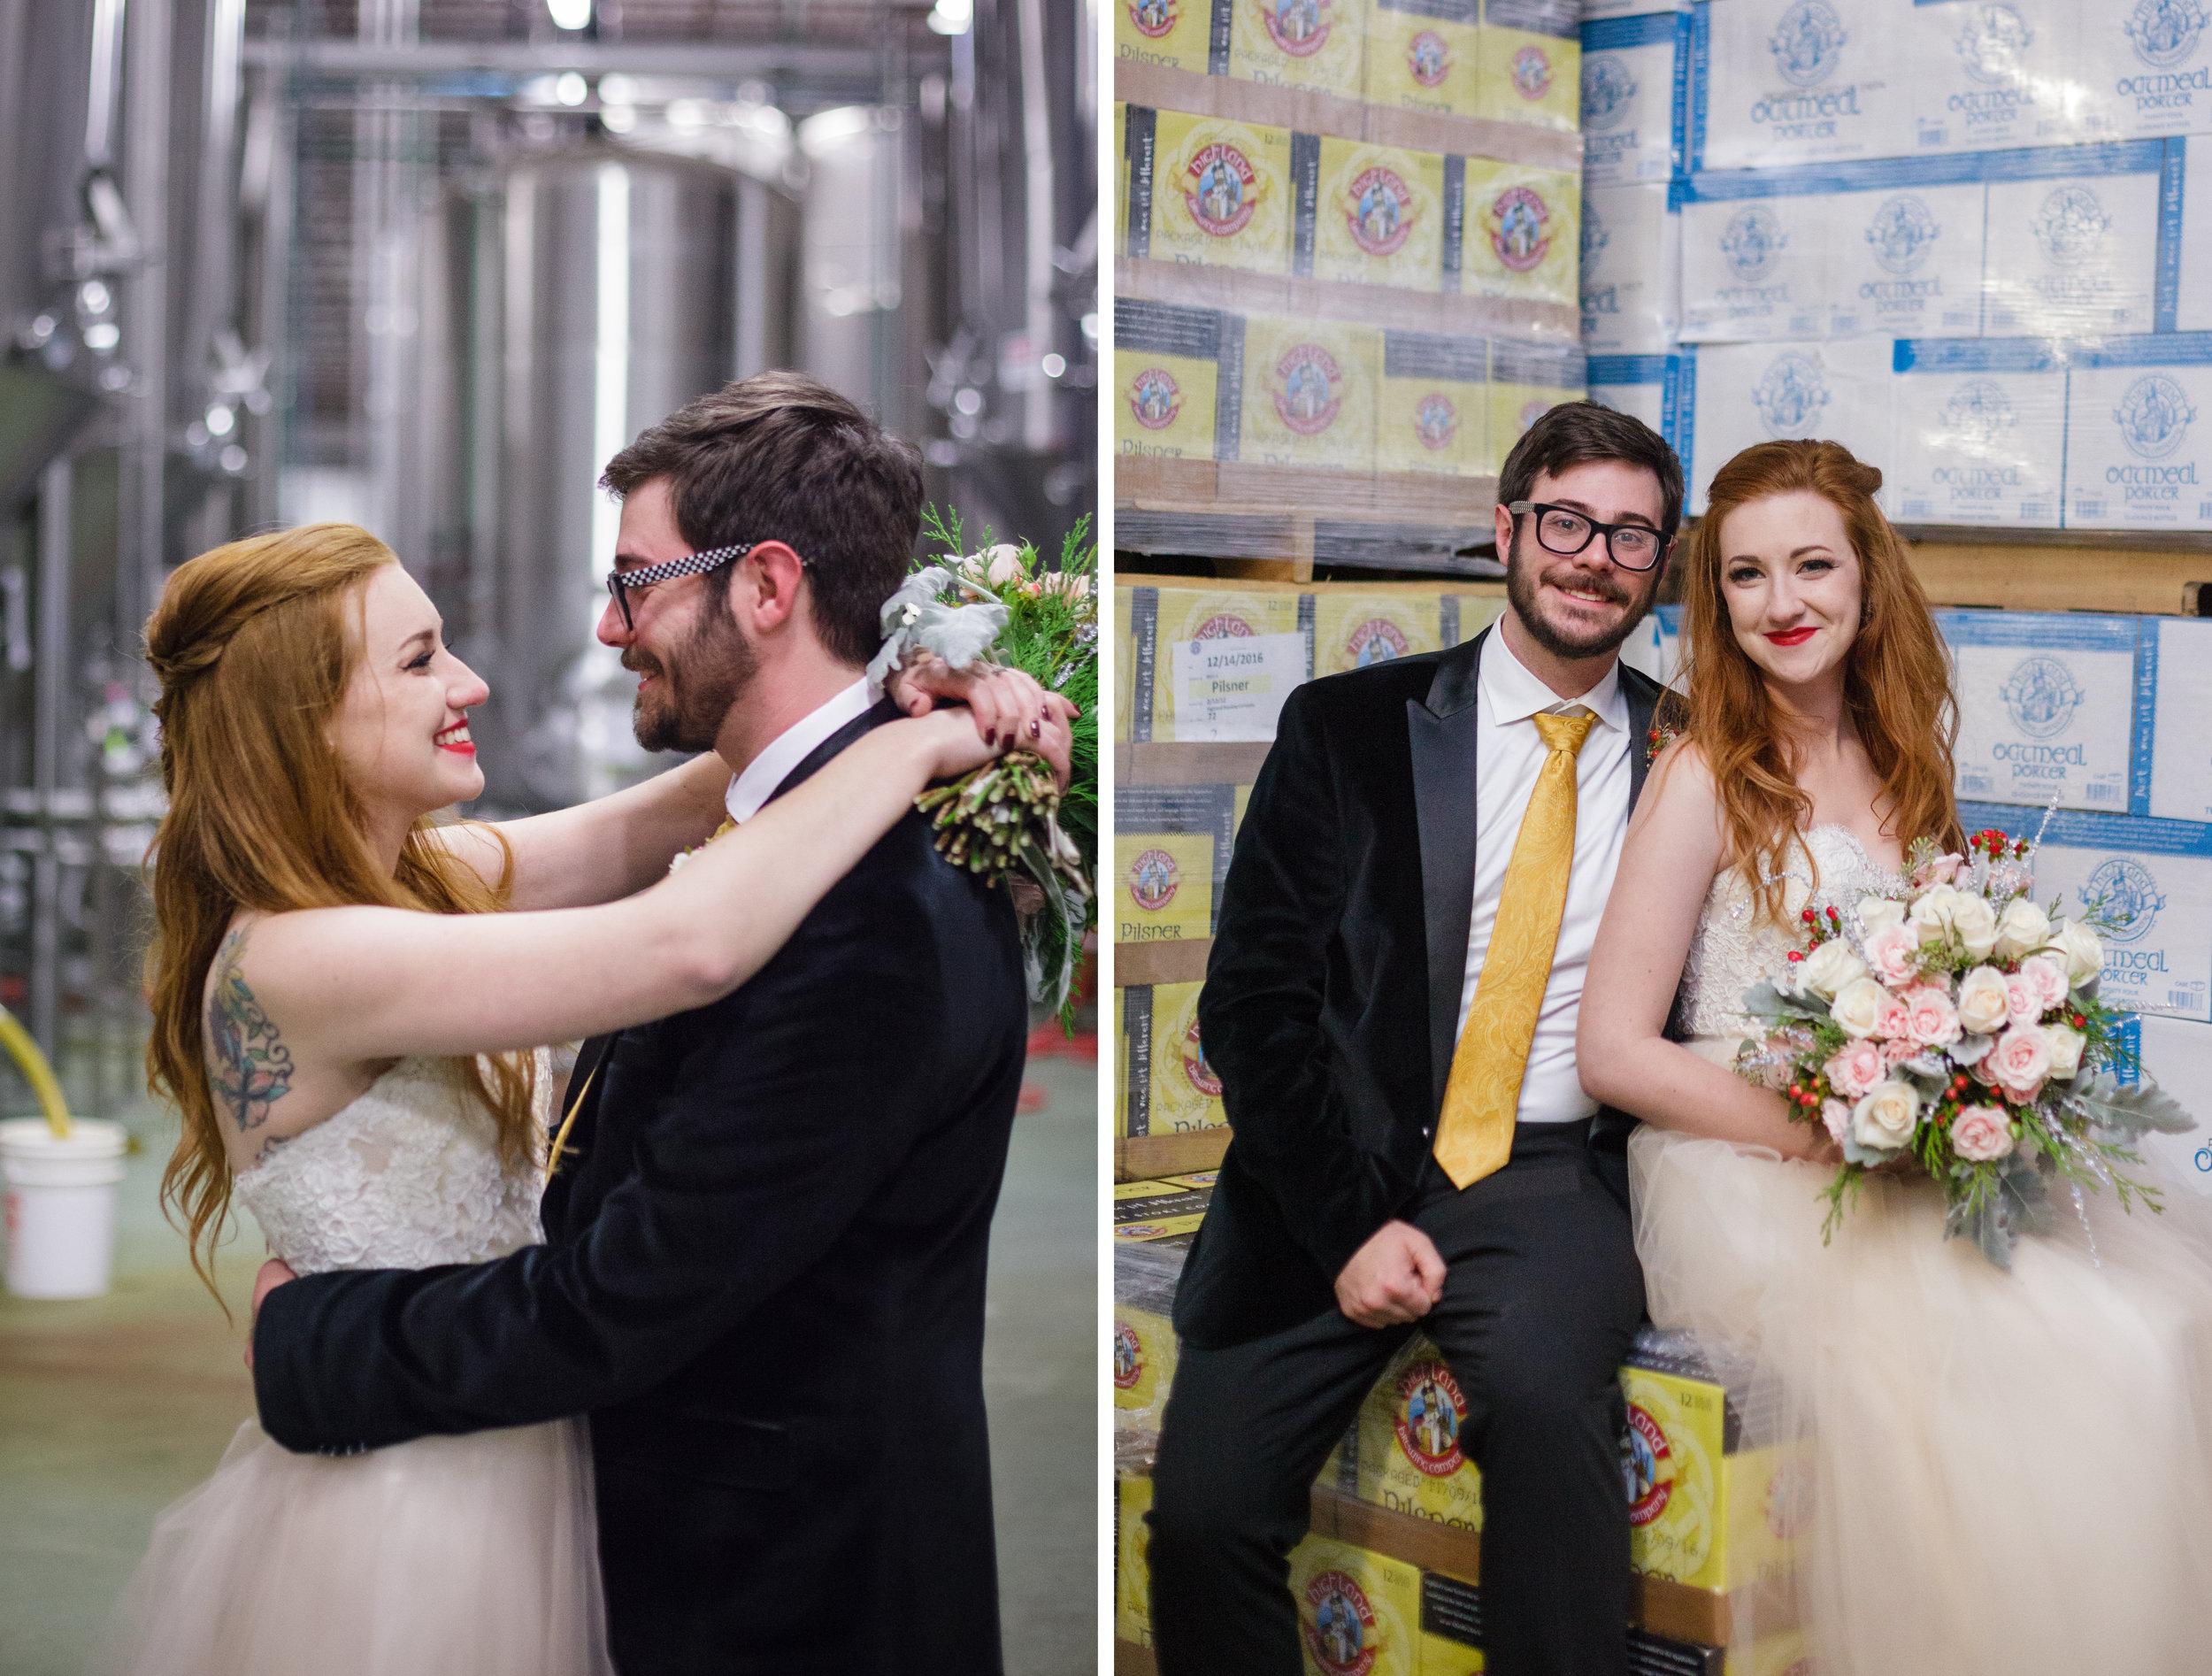 Highland Brewery Wedding 6.jpg